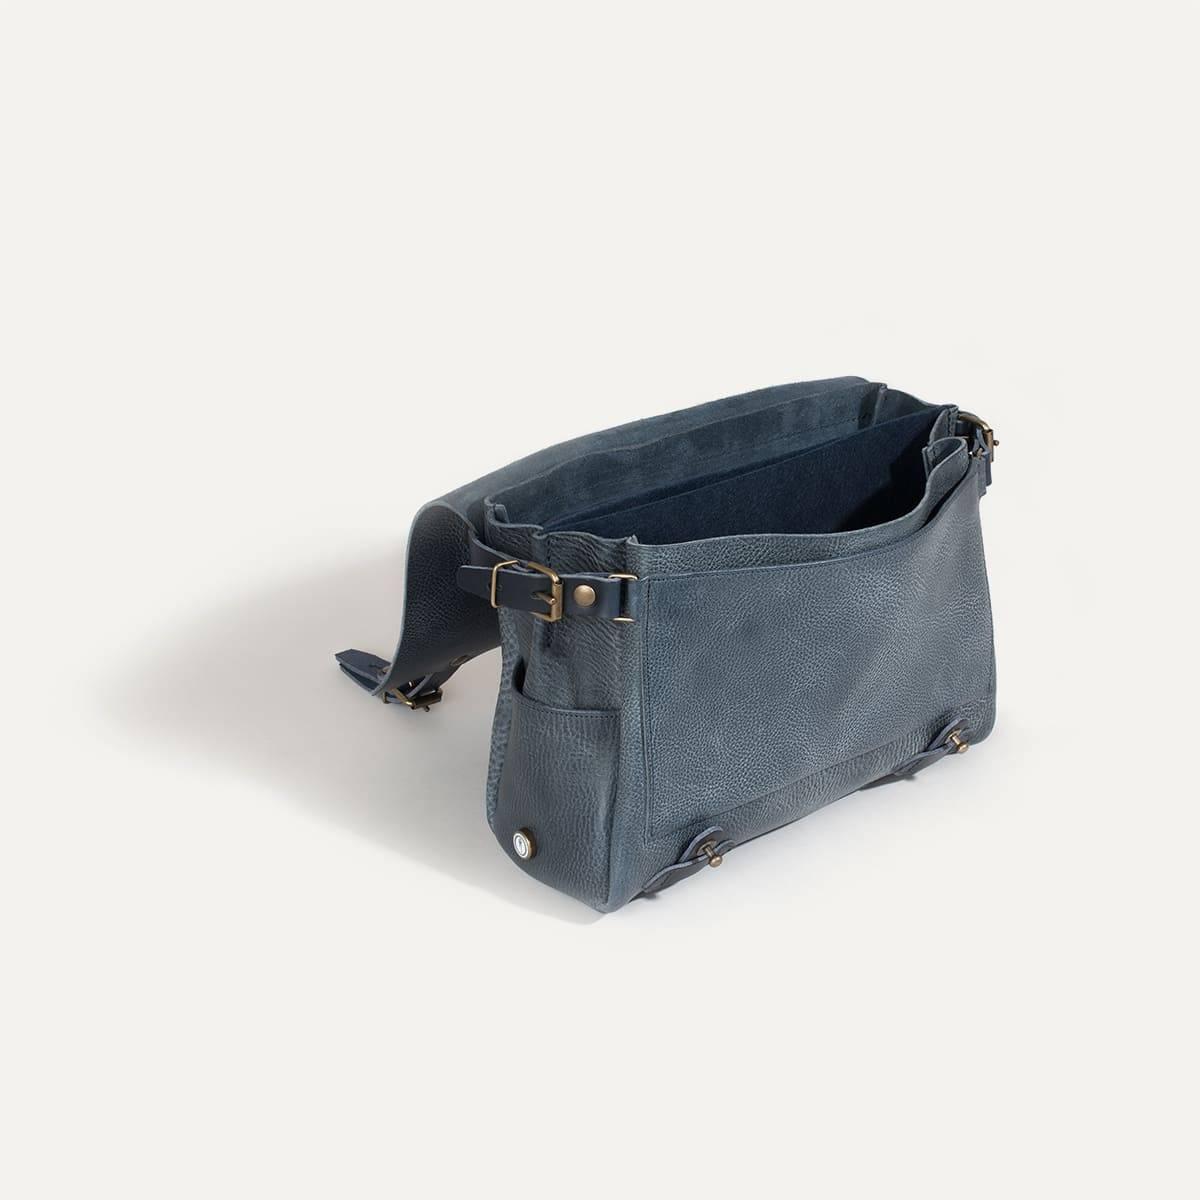 sac postier eclair i sac besace cuir tann v g tal bleu. Black Bedroom Furniture Sets. Home Design Ideas